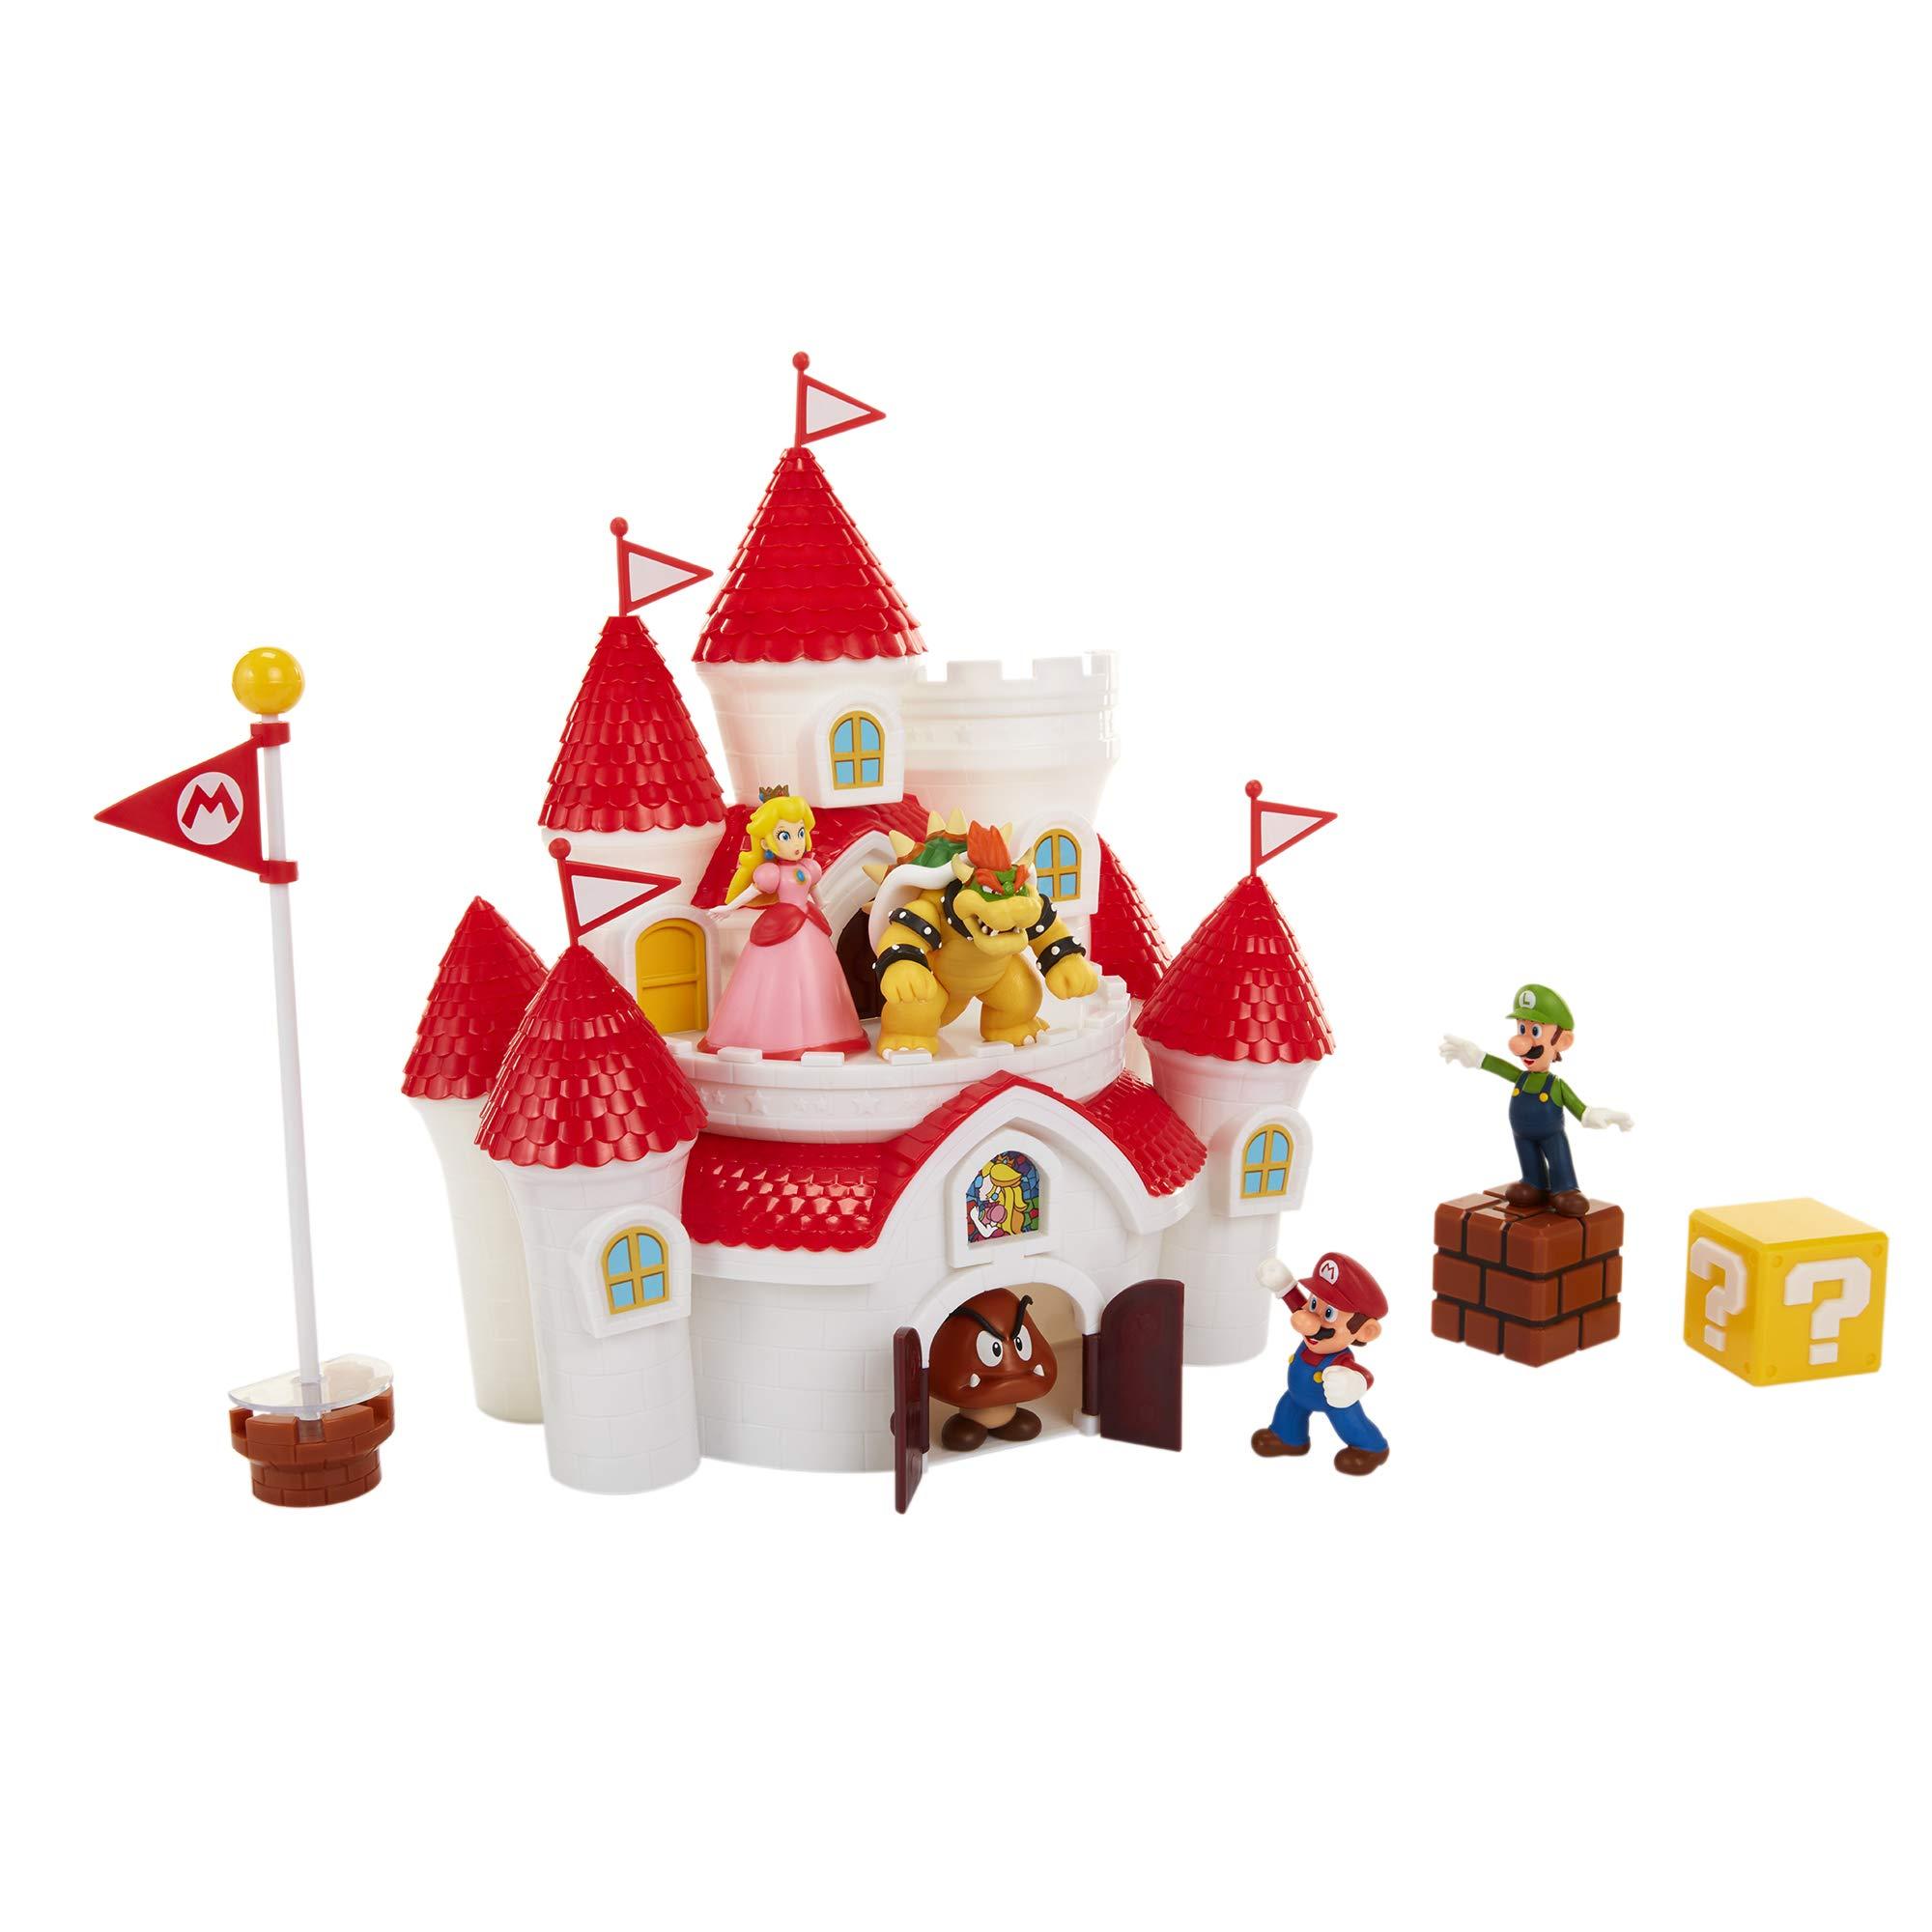 Nintendo Super Mario Deluxe Mushroom Kingdom Castle Playset with 5 Figures & 4 Accessories by Nintendo (Image #4)